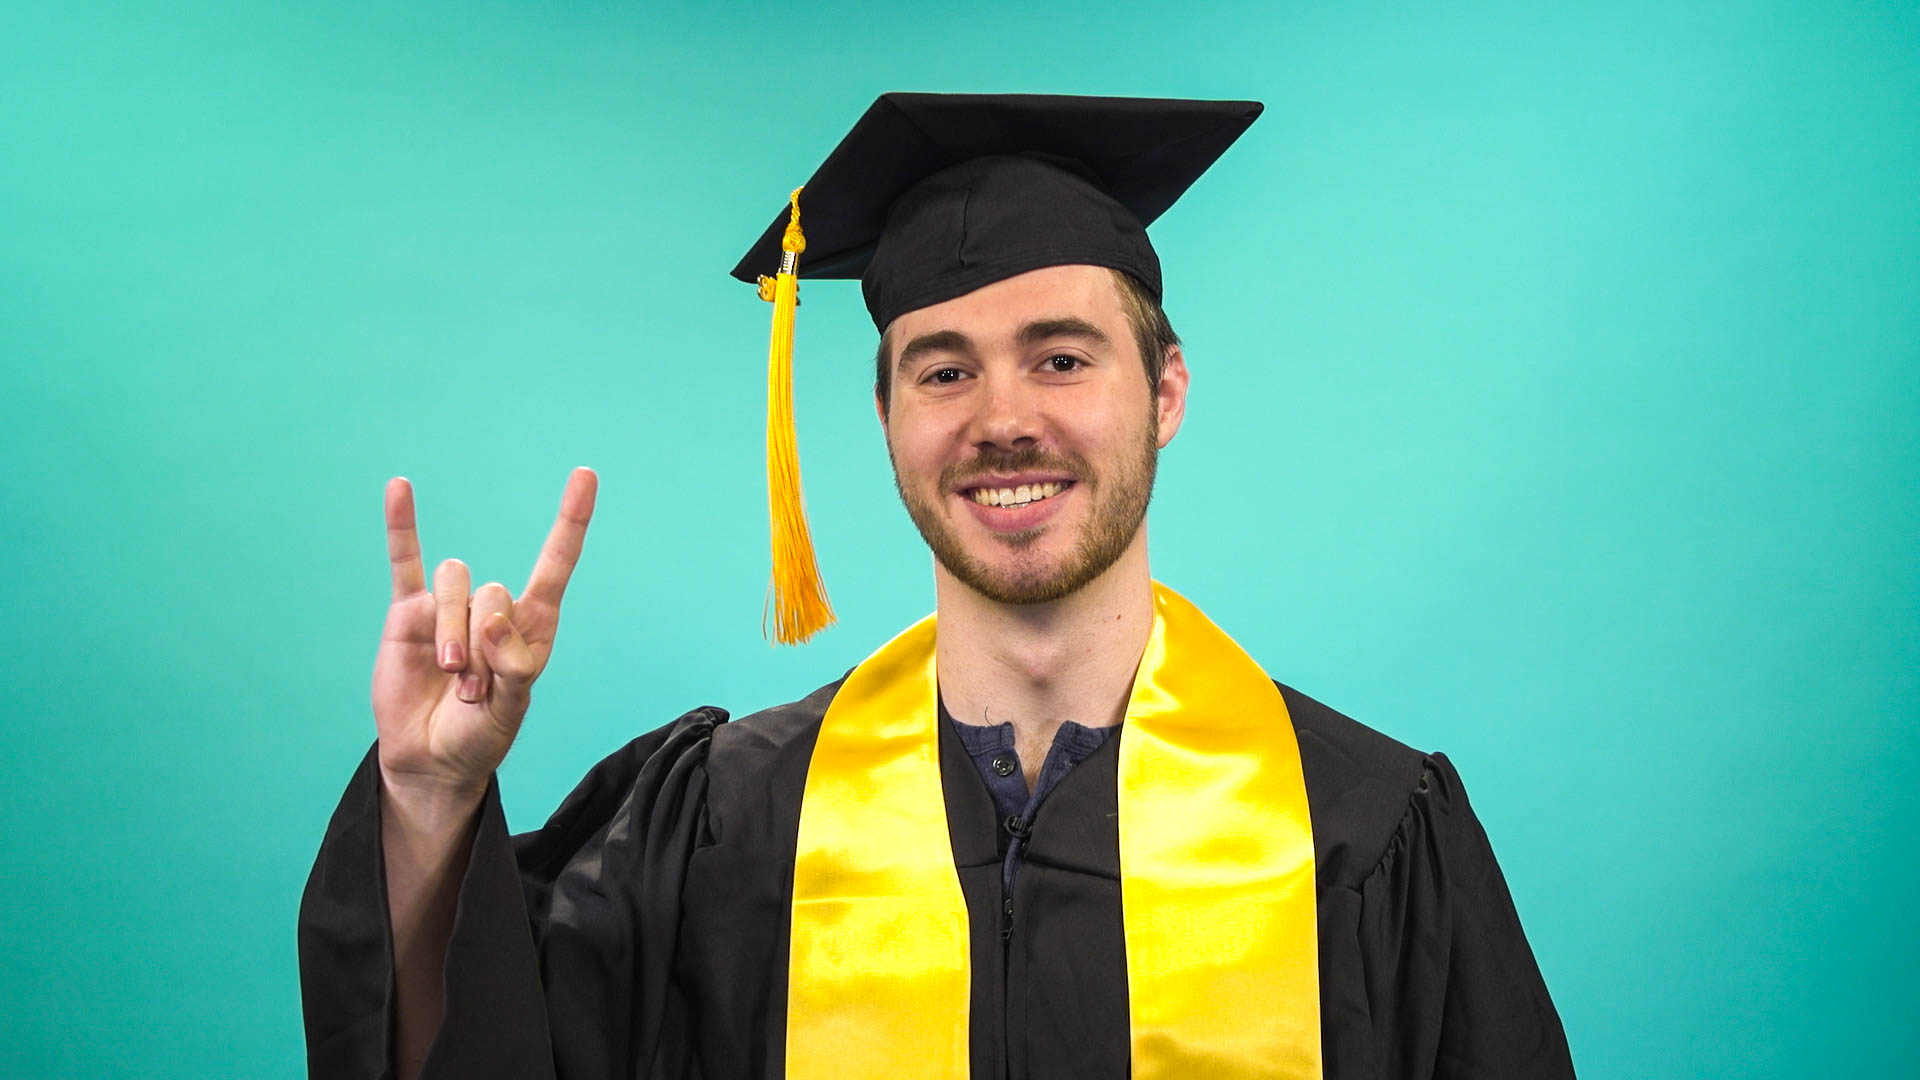 UT News - The University of Texas at Austin